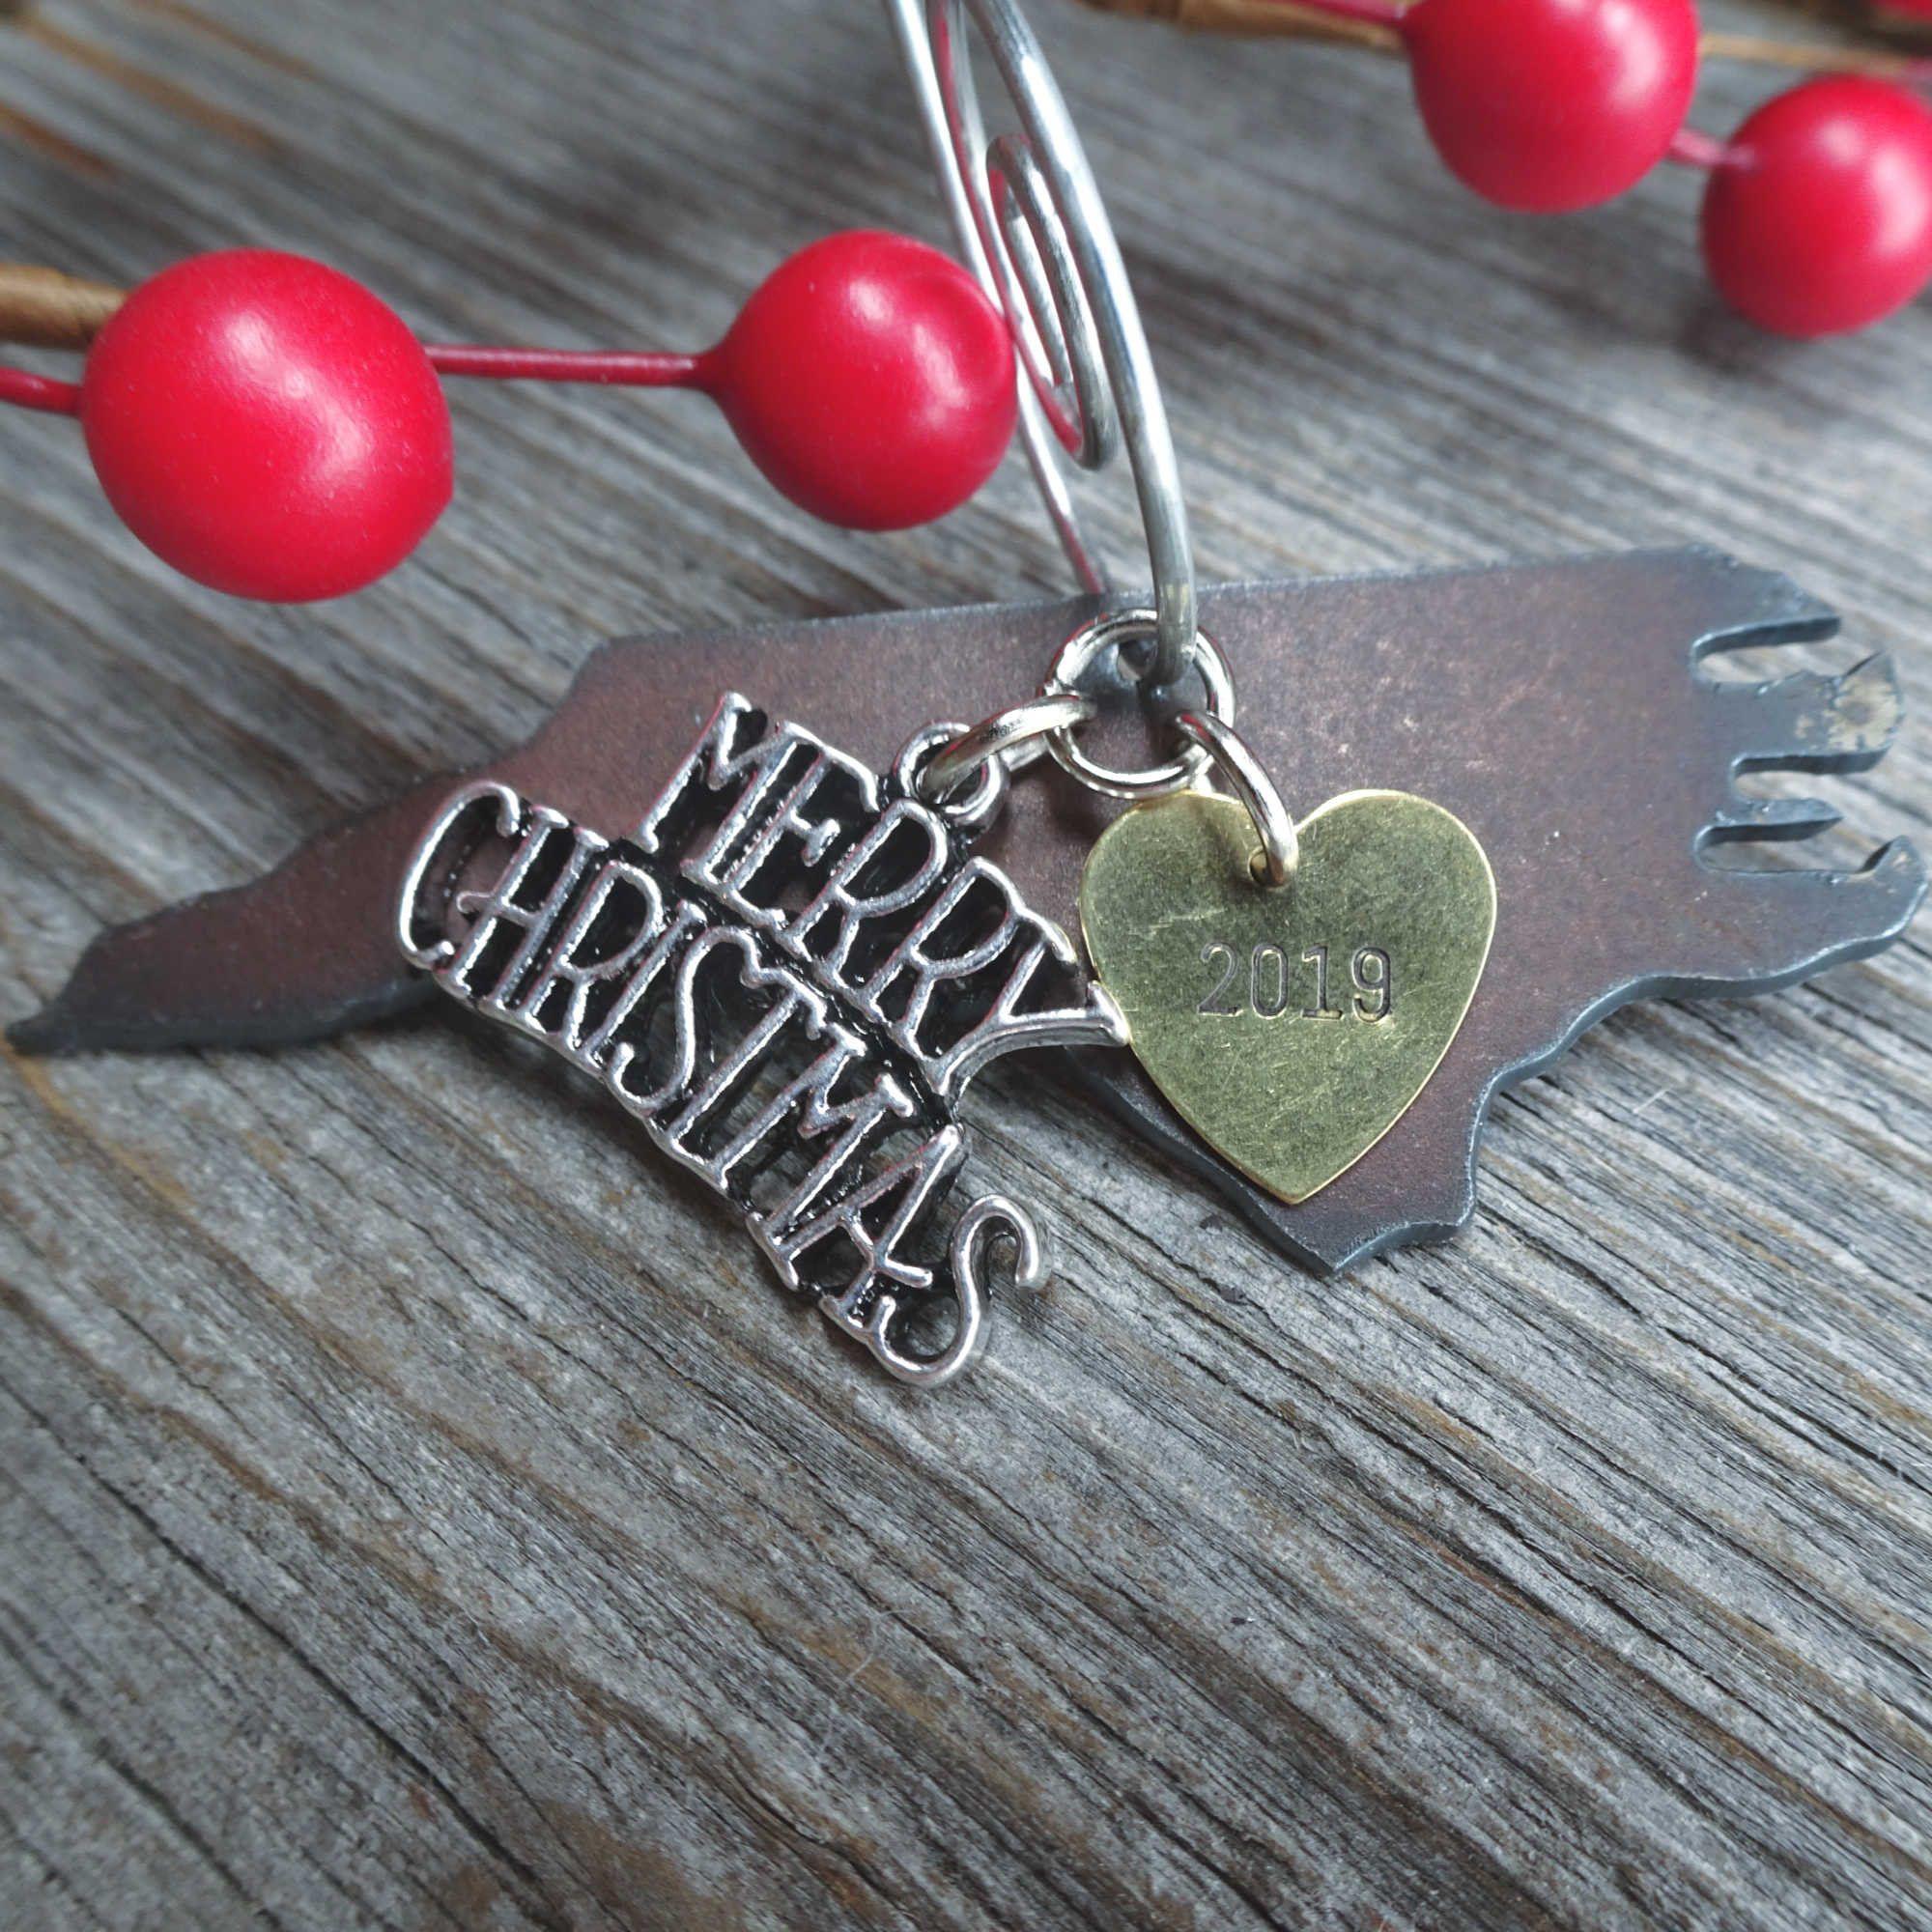 North carolina christmas ornament small rustic metal hand